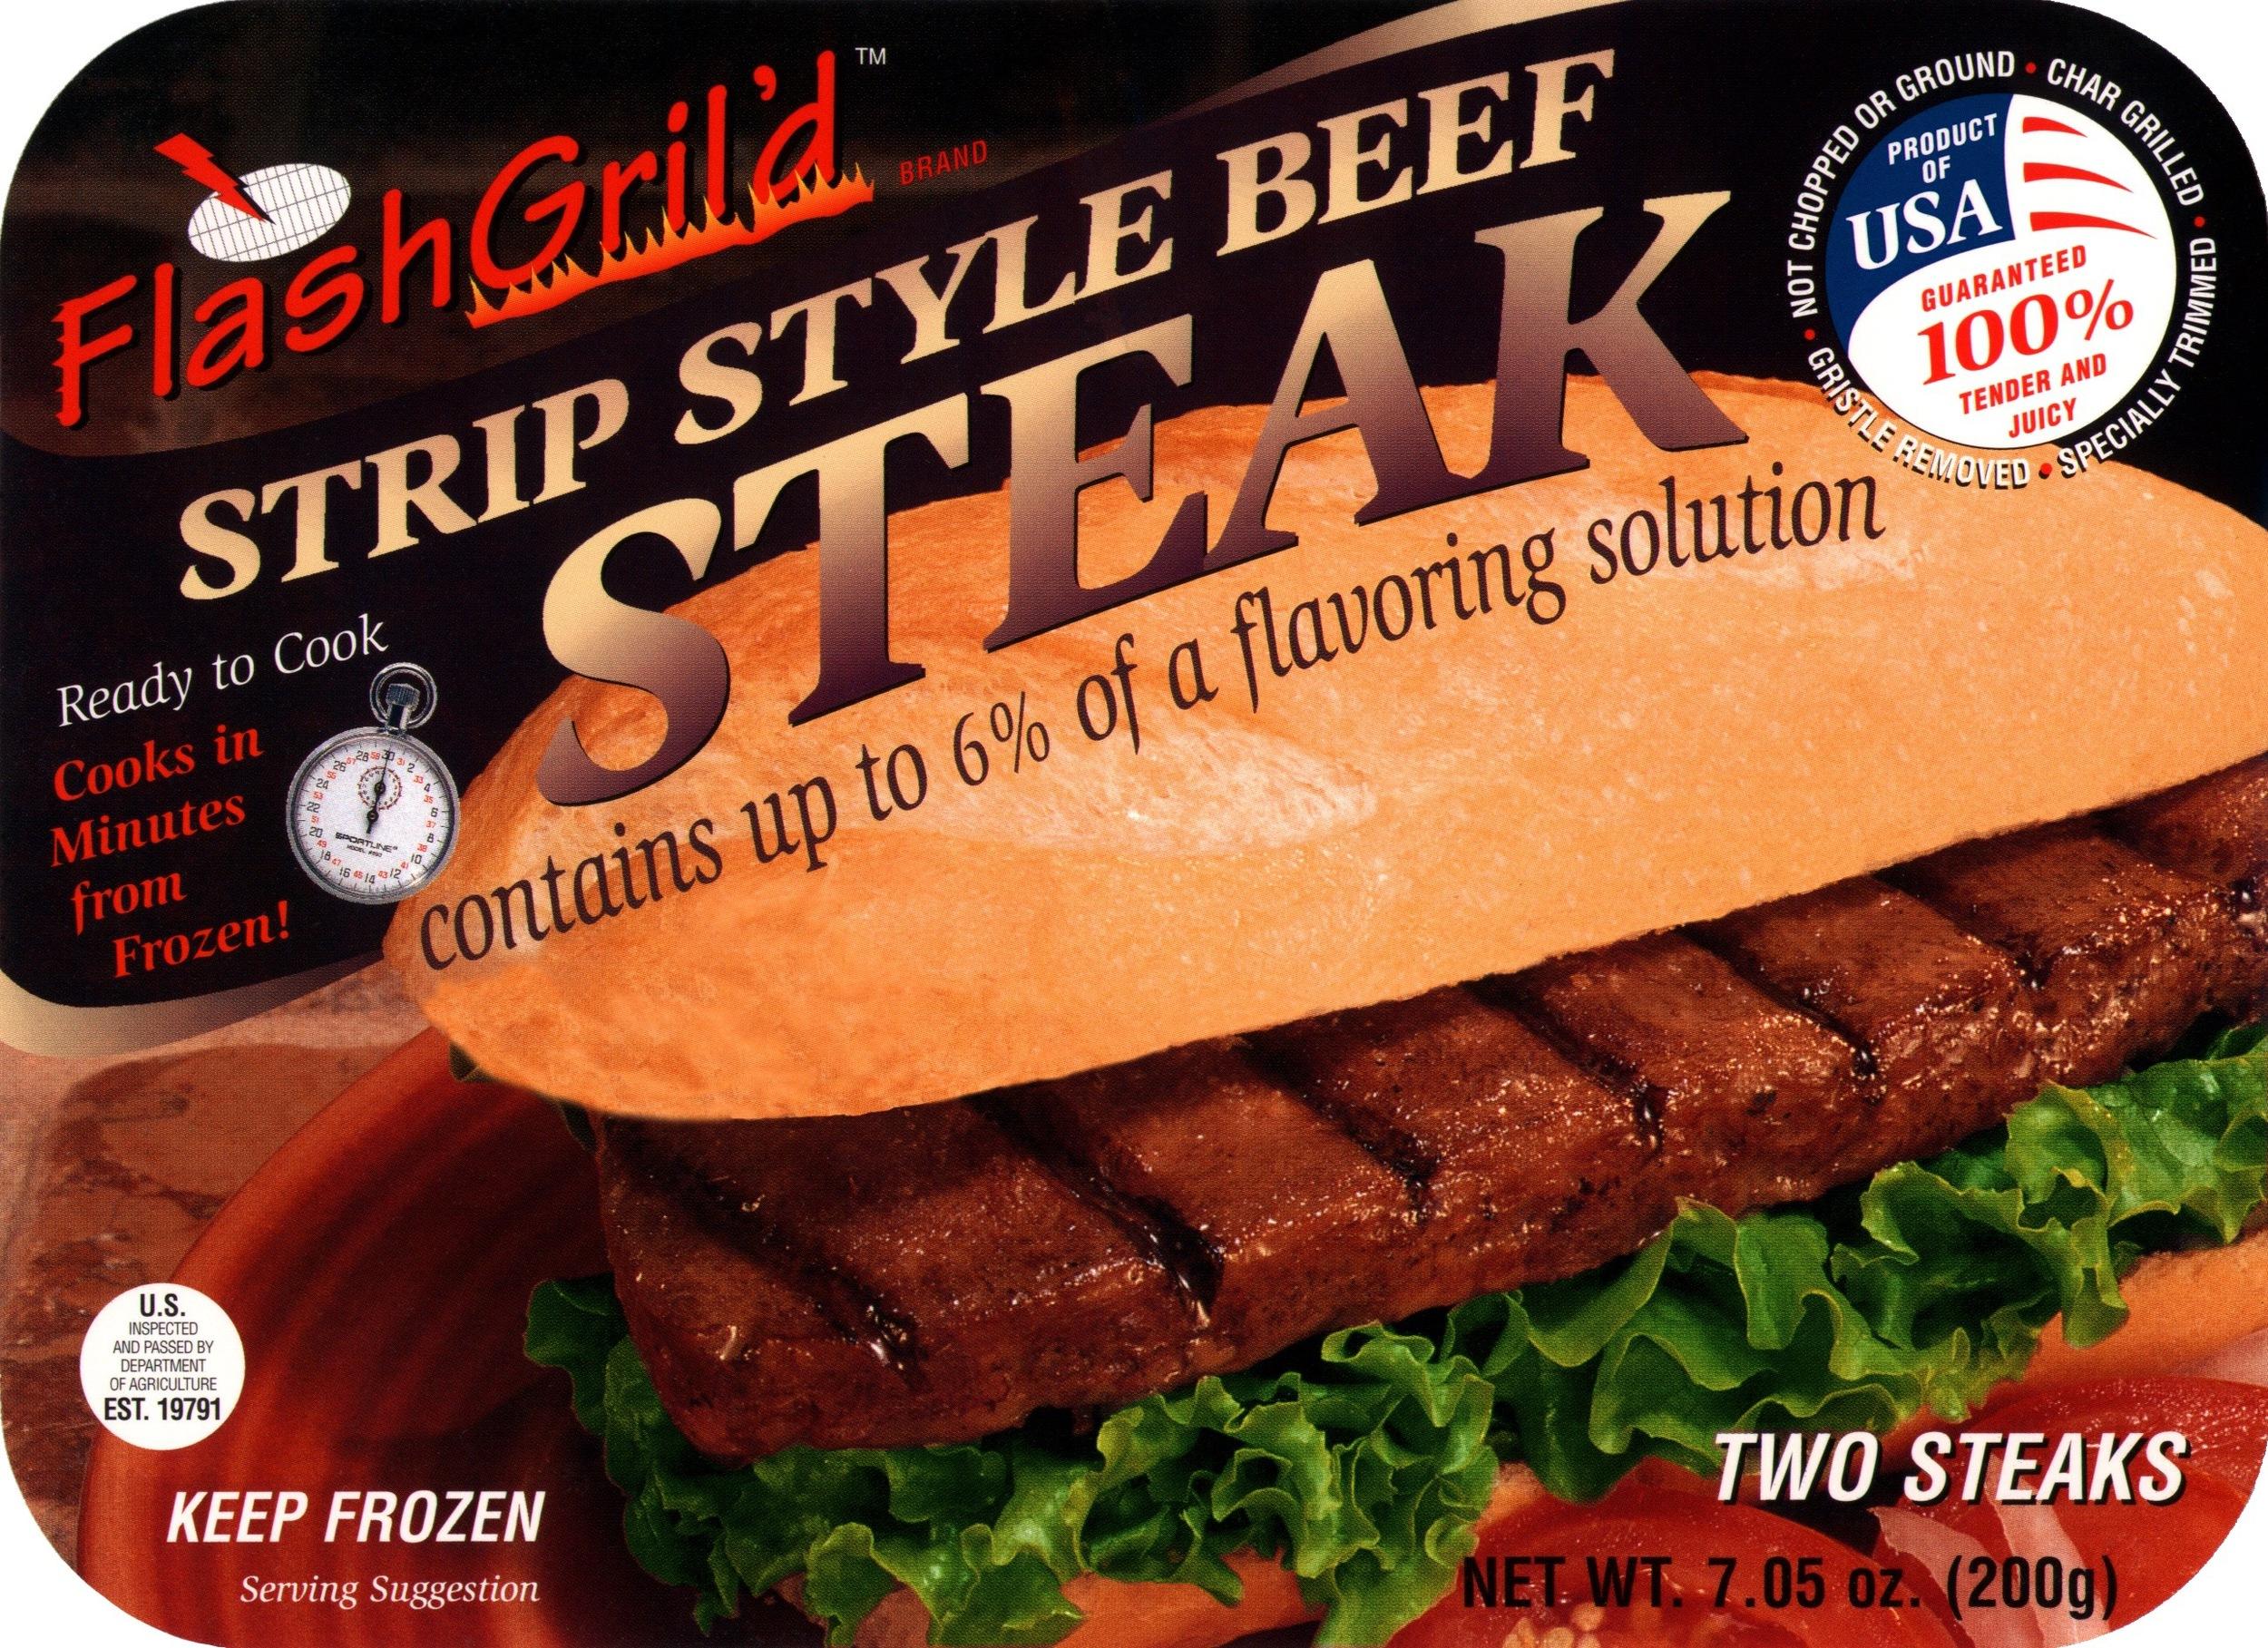 Flash Grid Steak.jpg